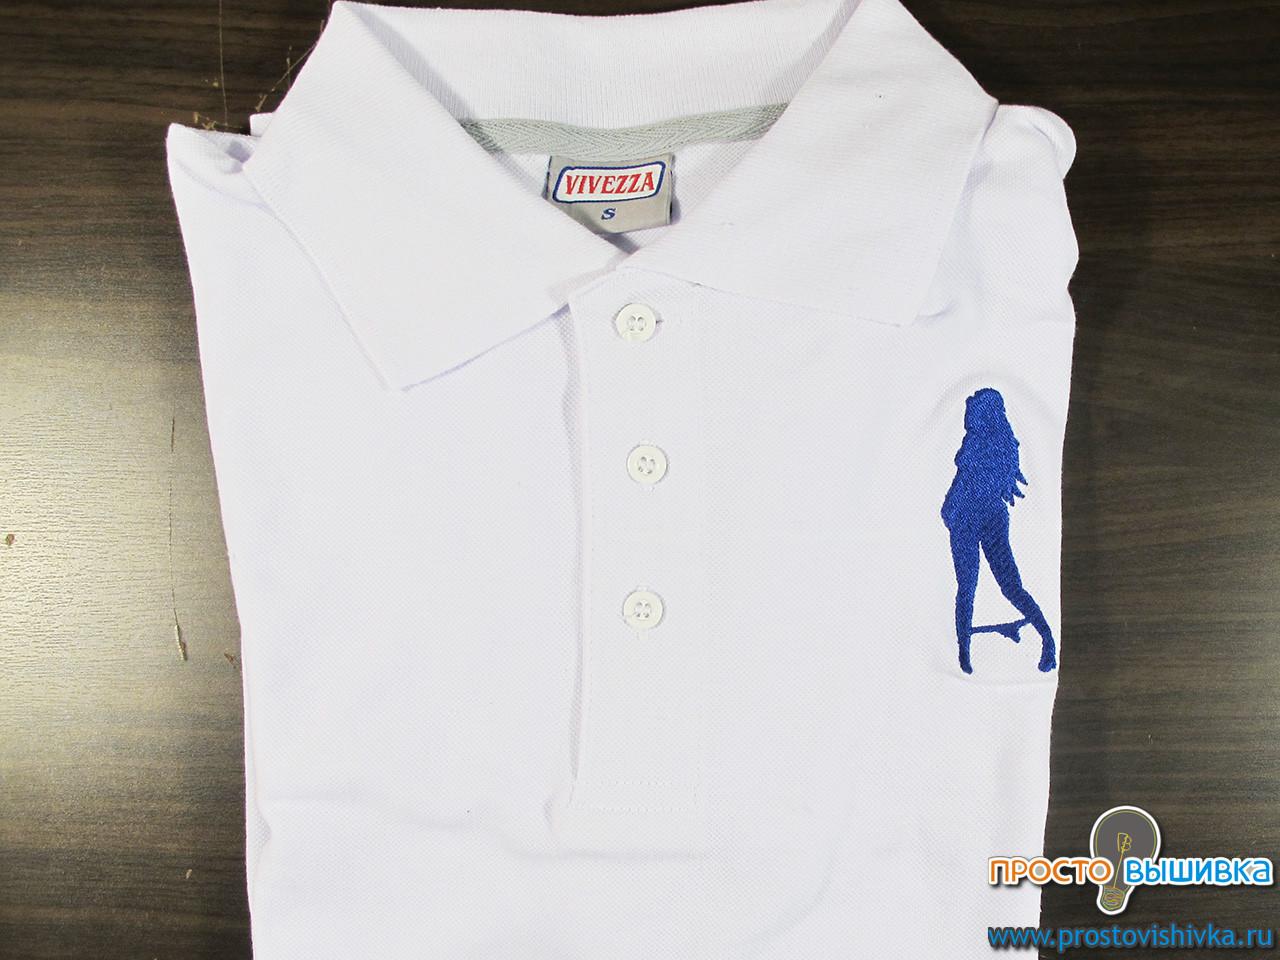 Вышивка на рубашке для девушки